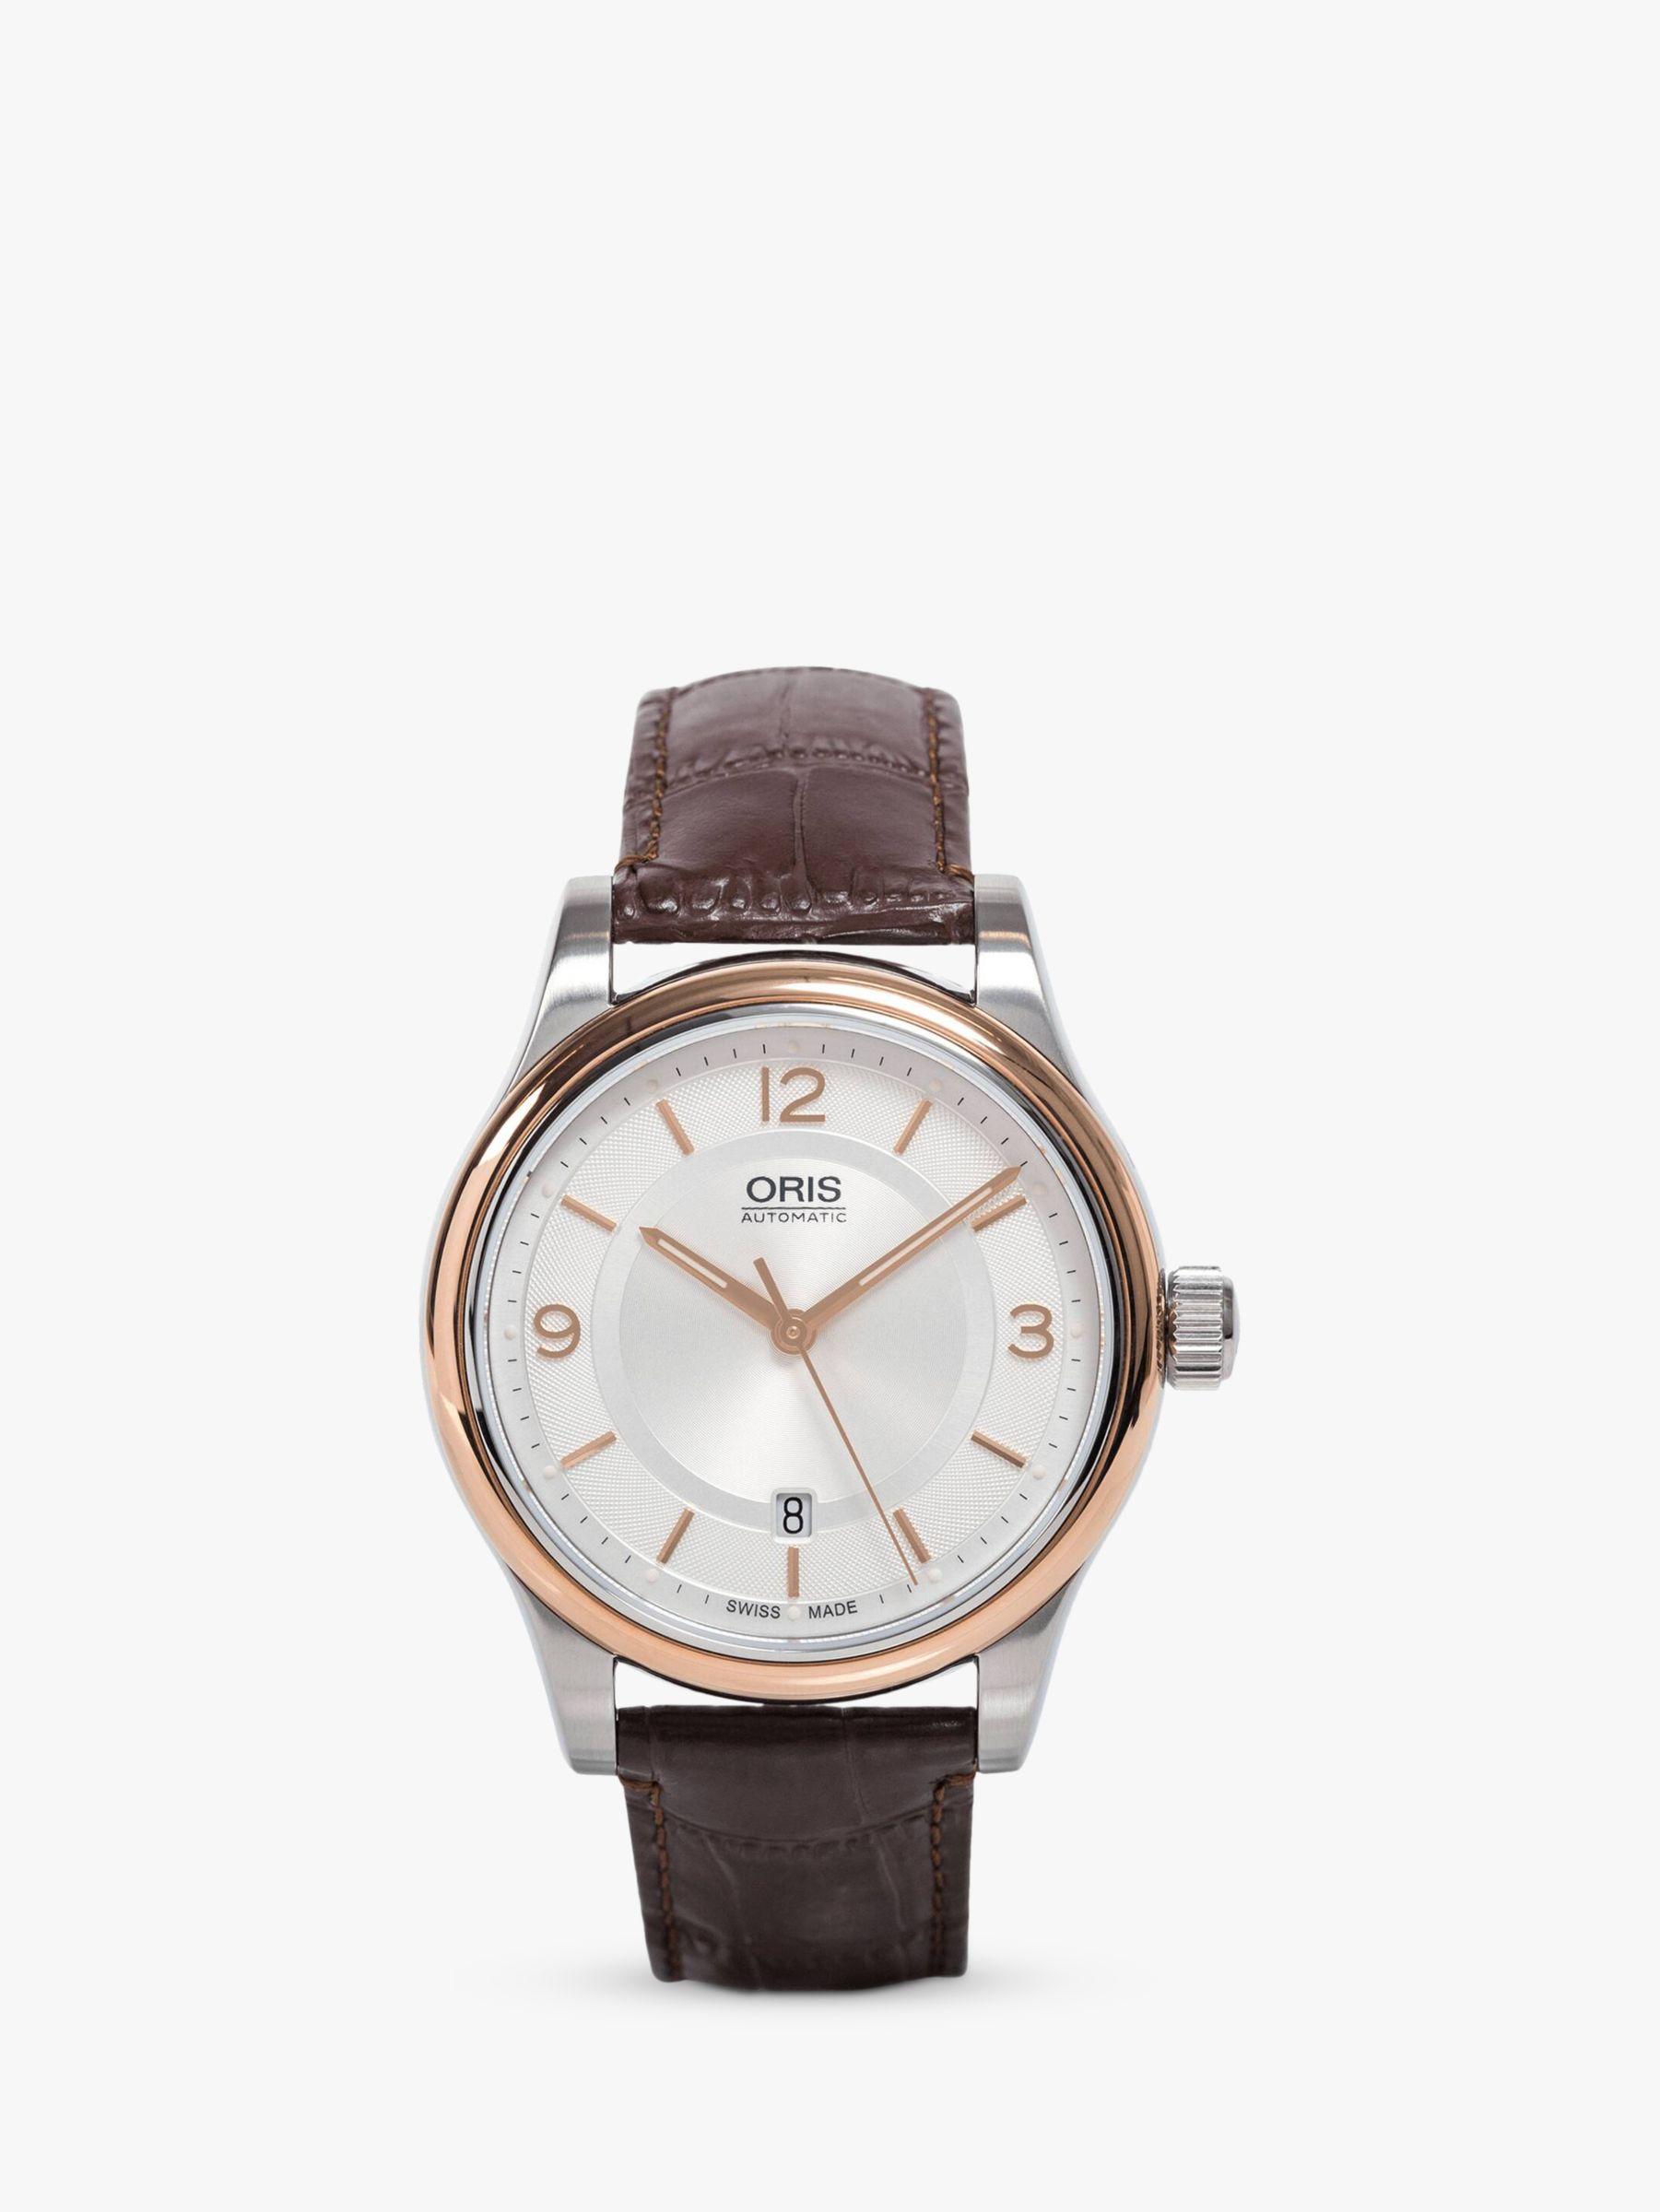 Oris Oris 73375944331LS Men's Classic Leather Strap Watch, Black/Silver